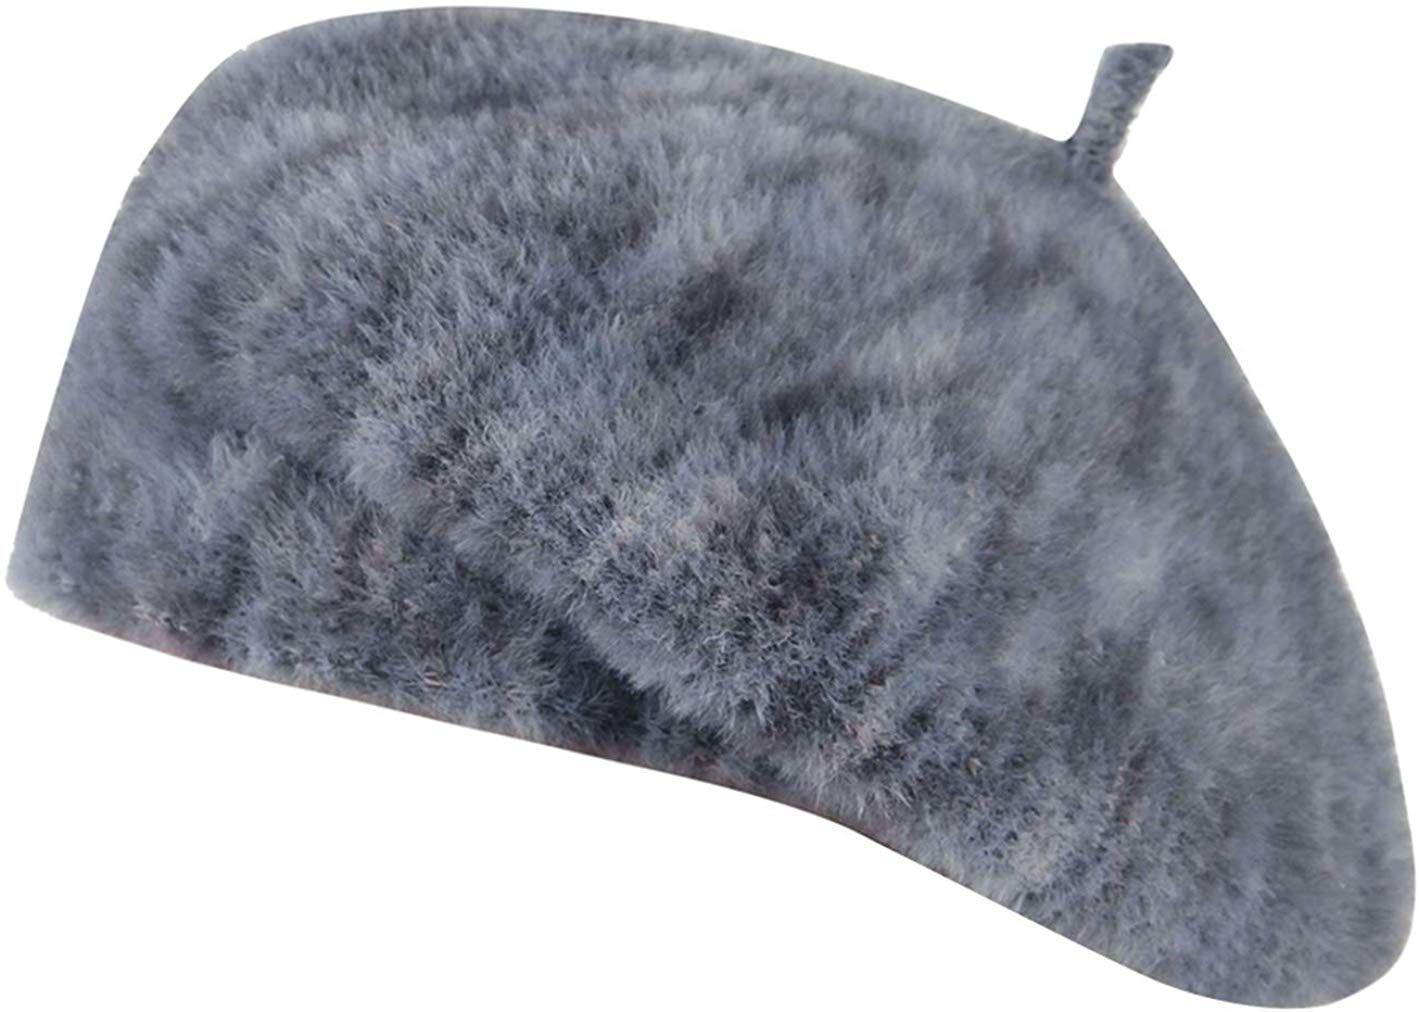 Binse beret hat wool knitted cap artist hat beanie cap winter hat ,  #artist #Beanie #Beret #...,  #Artist #Beanie #Beret #Binse #Cap #Hat #Knitted #Winter #Wool